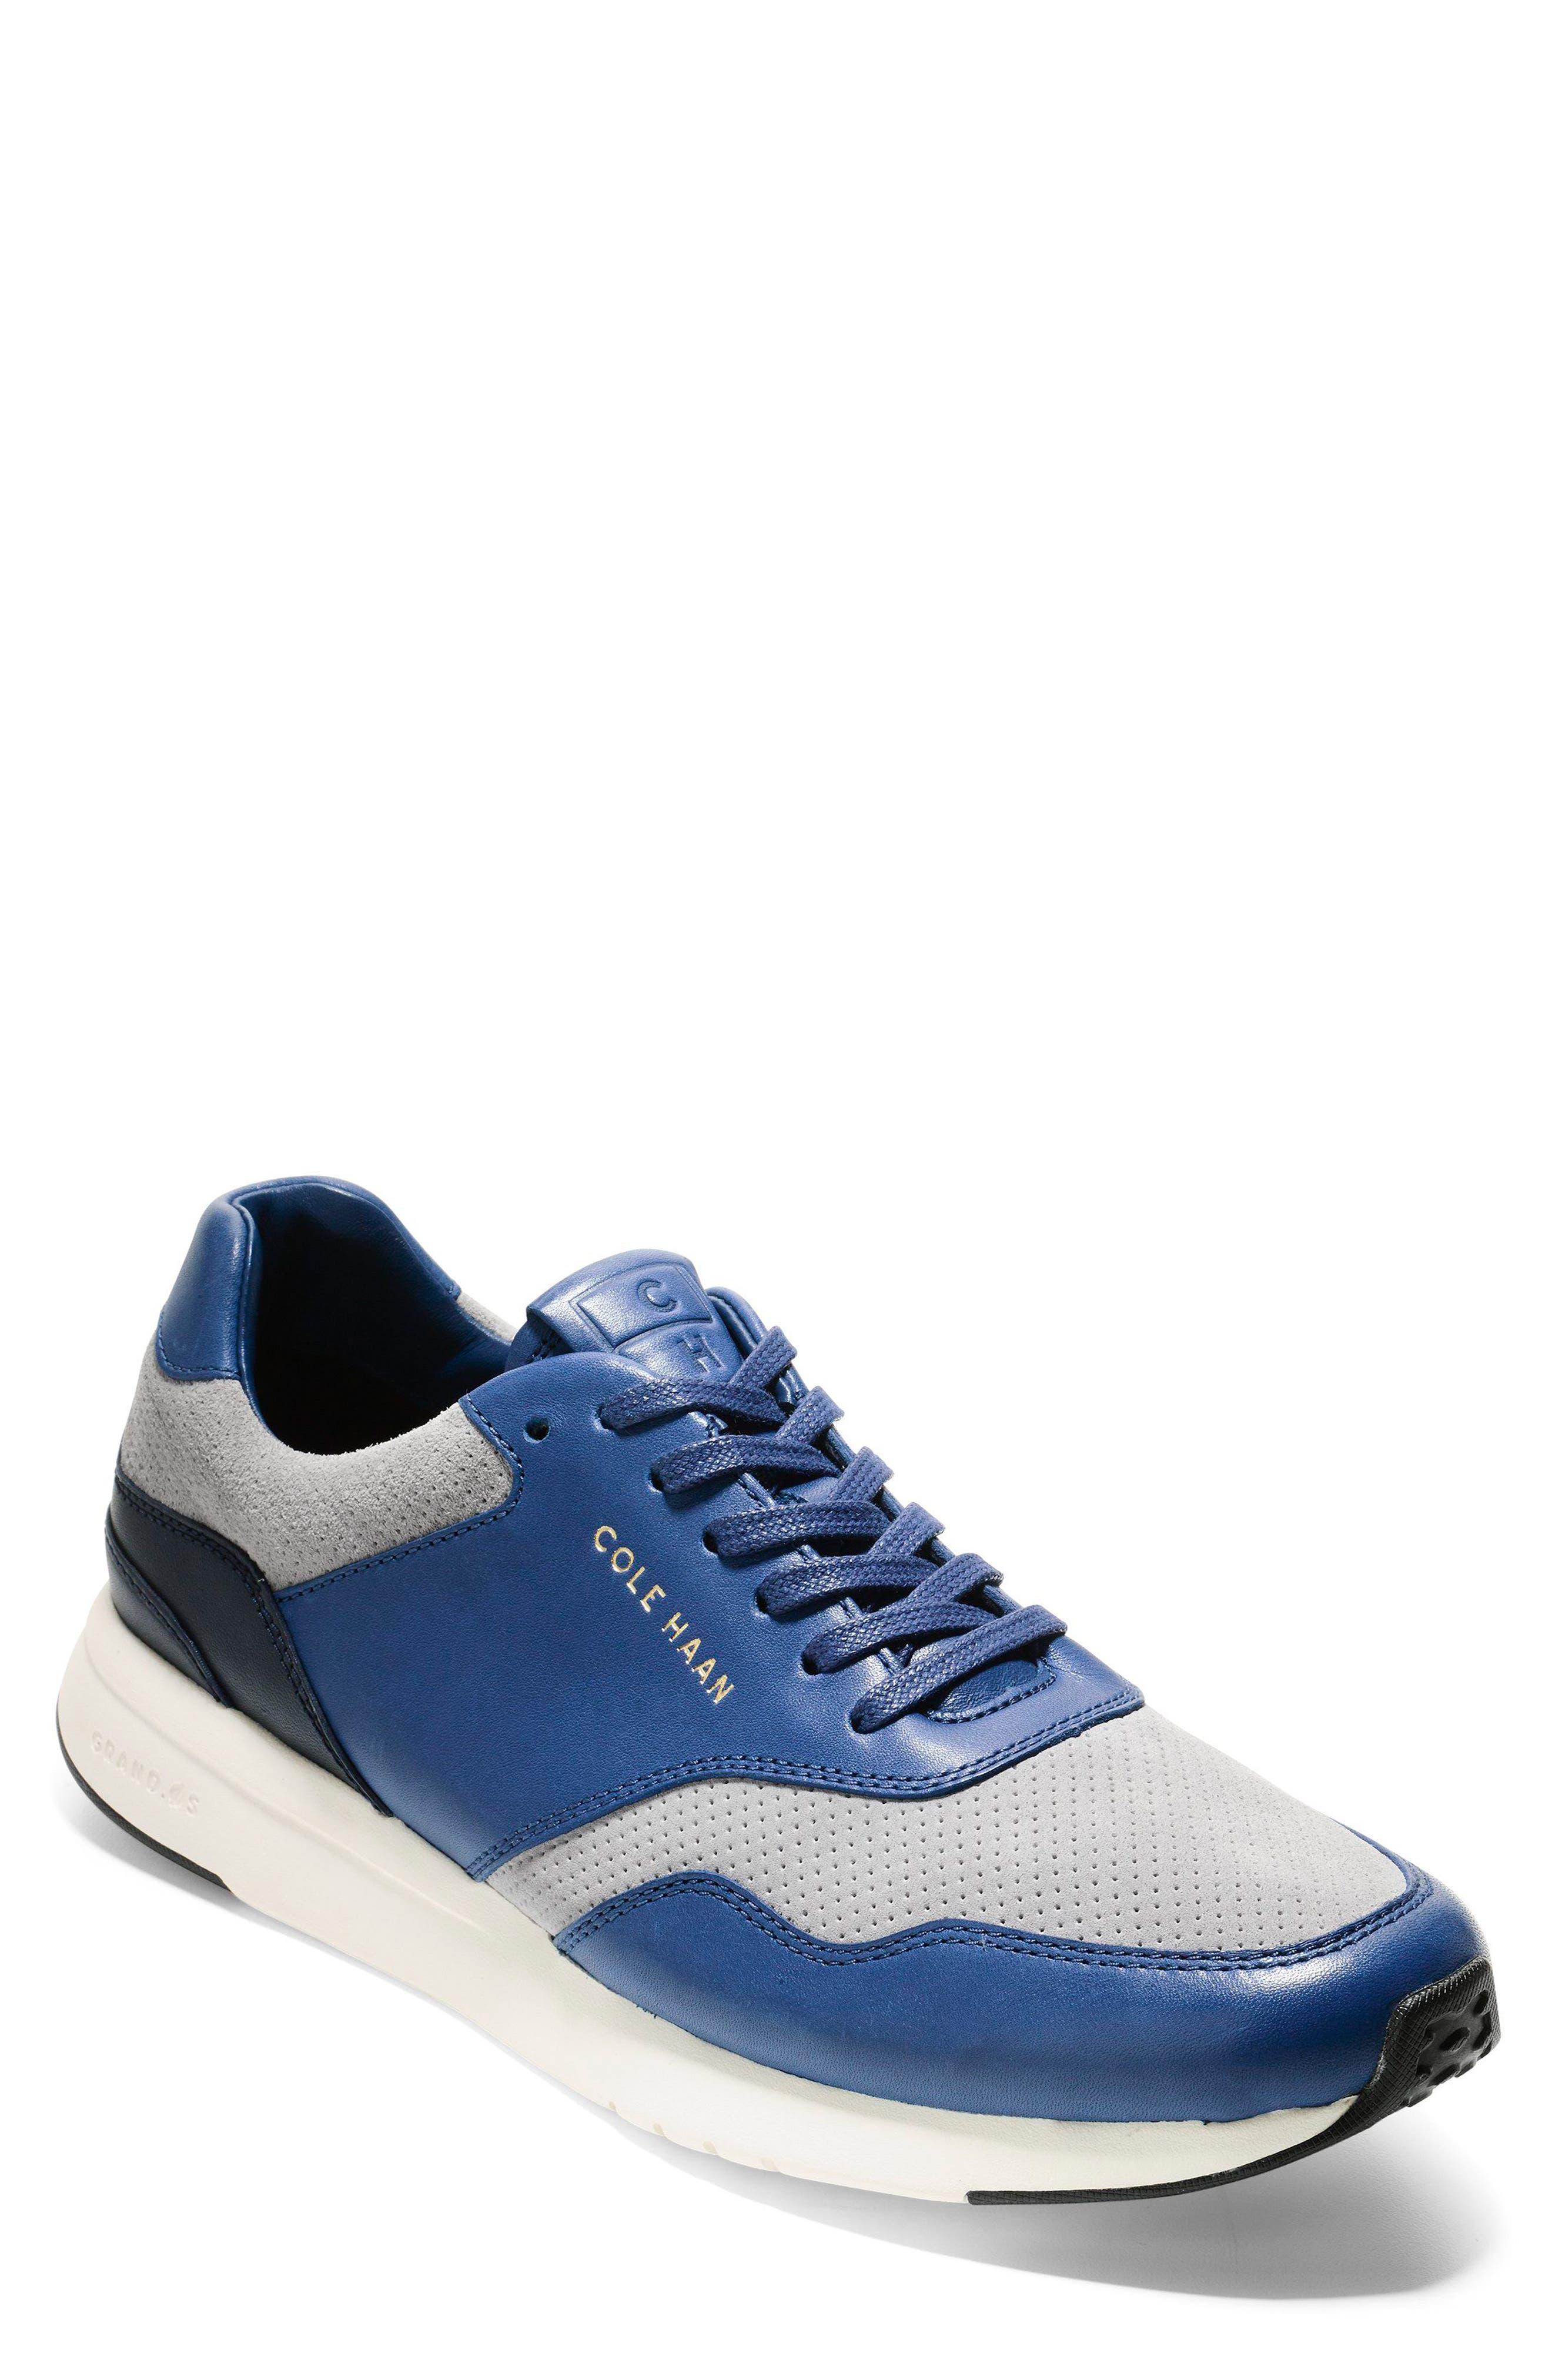 GrandPro Runner Sneaker,                         Main,                         color,